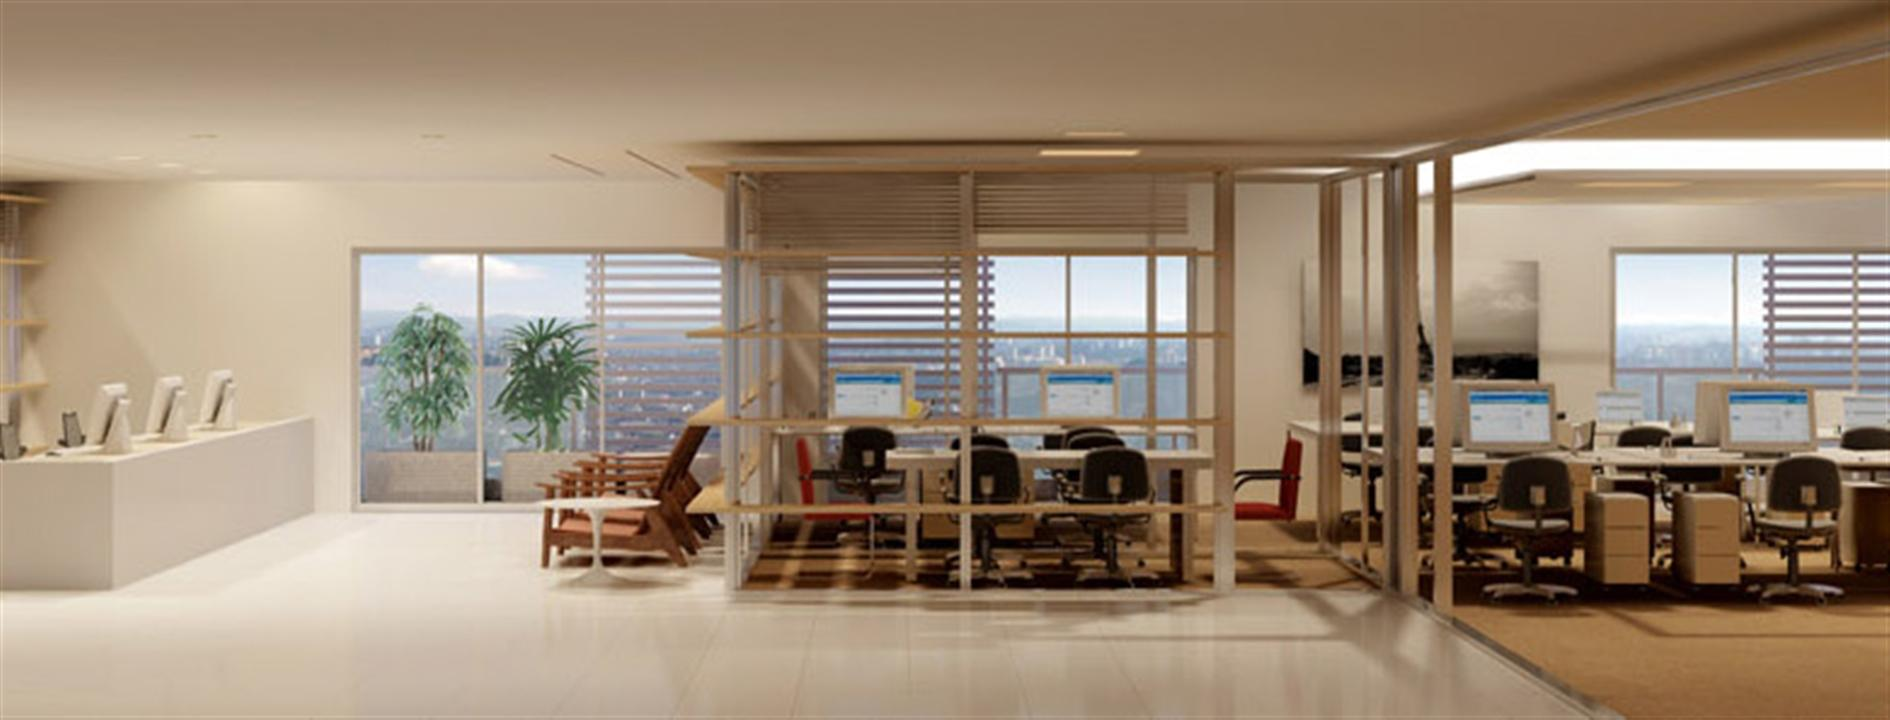 Office | Nasa Business Style – Salas Comerciaisno  Setor Marista - Goiânia - Goiás